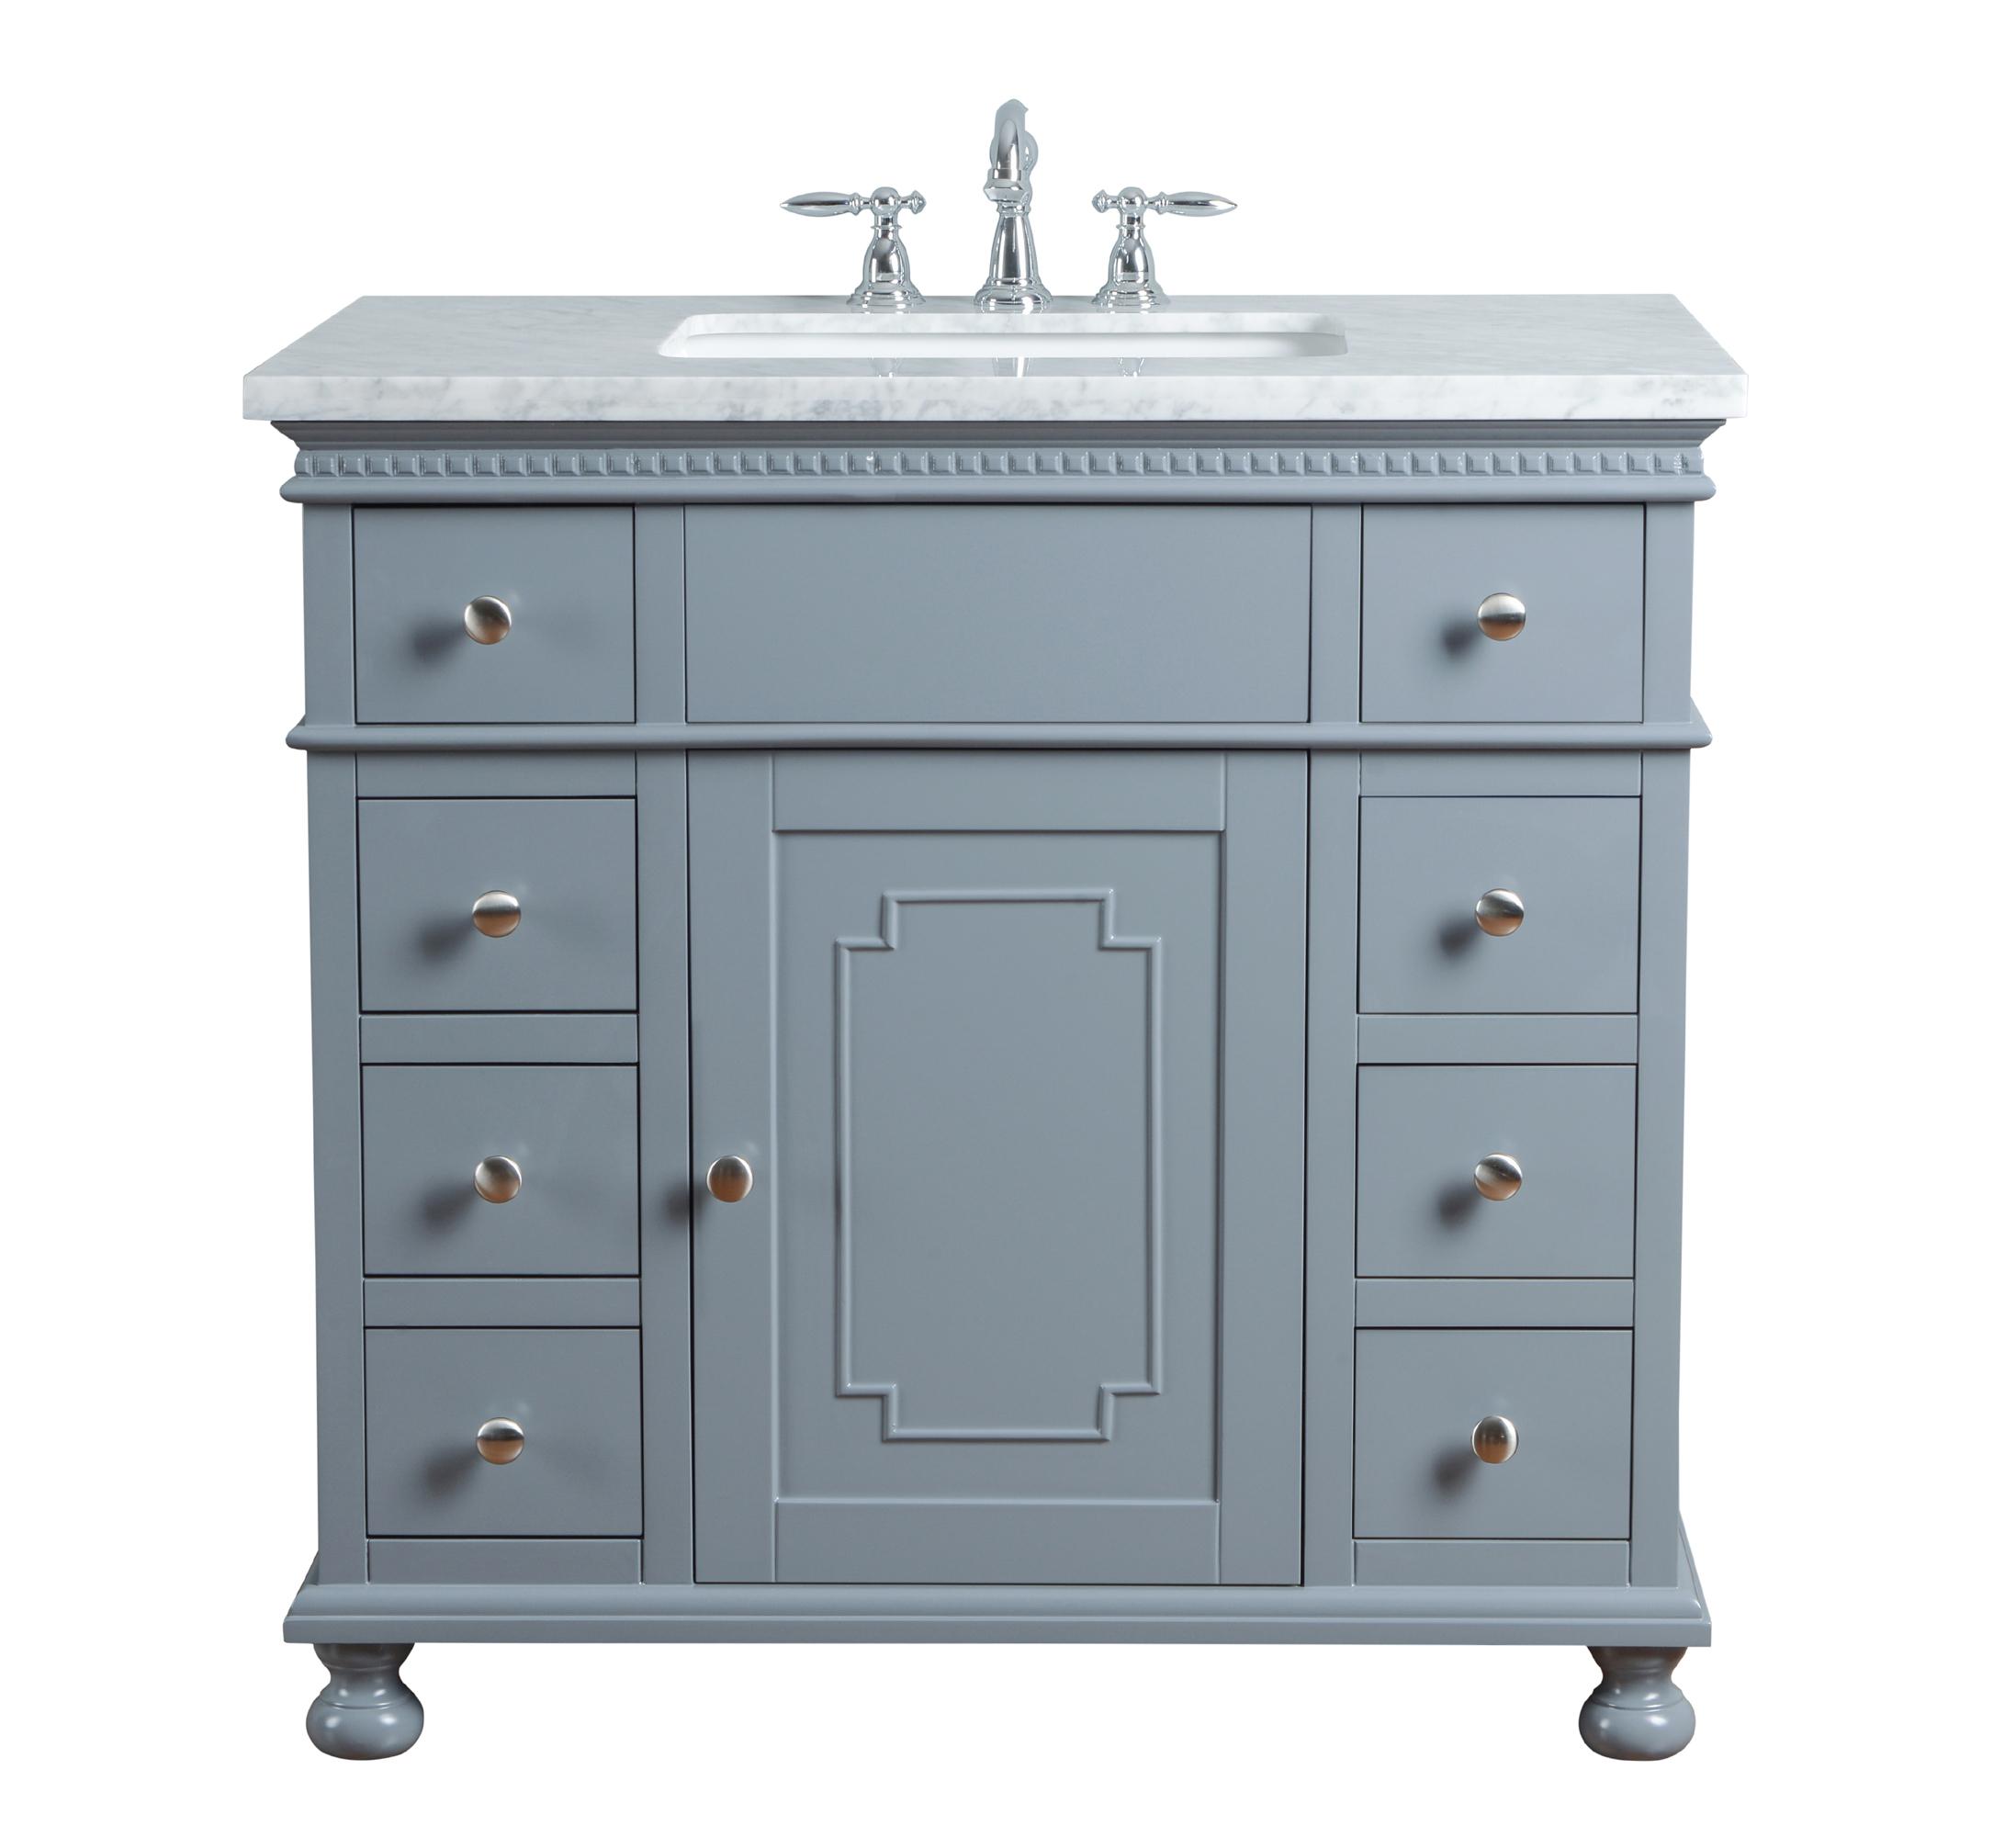 Abigail Embellished 36-inch Single Sink Bathroom Vanity - Grey